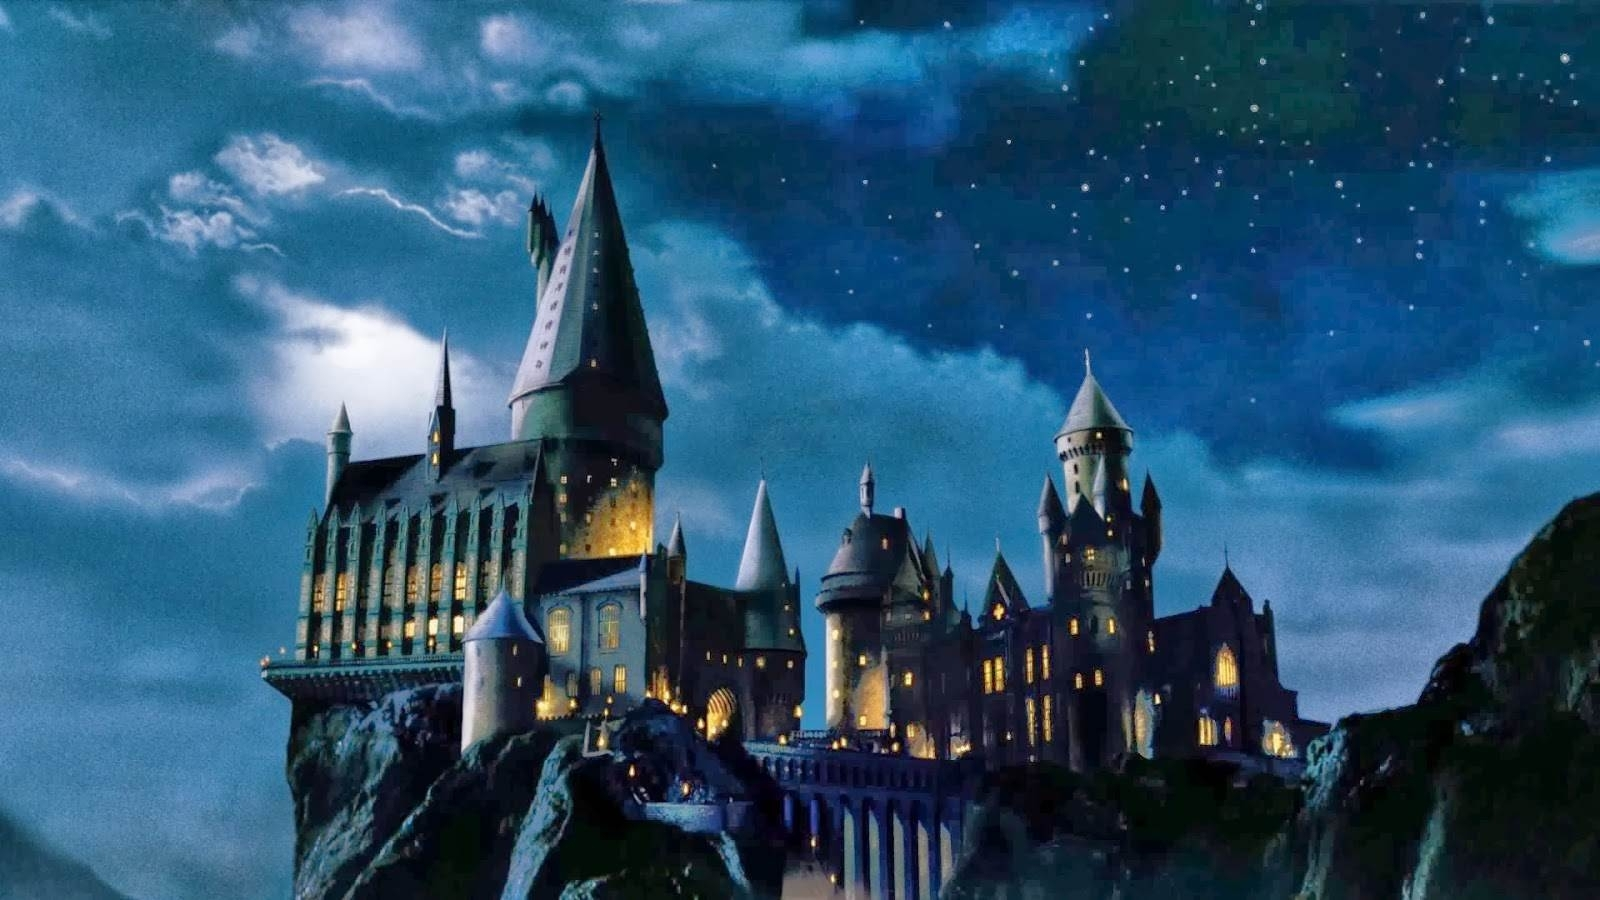 harry potter wallpaper hogwarts wallpaper desktop background 1600